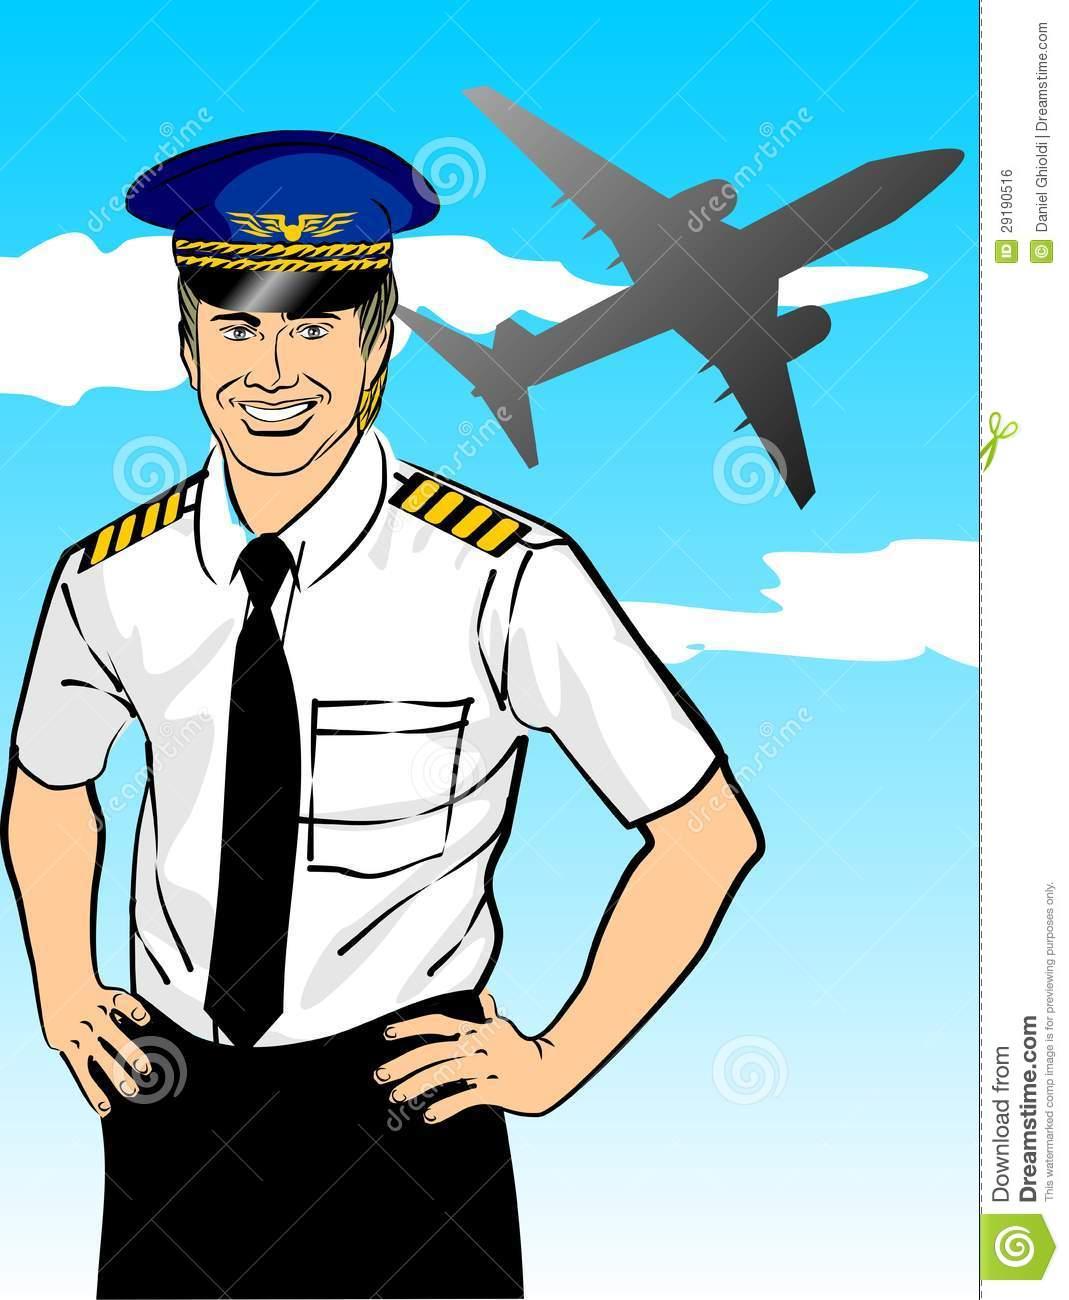 Airplane clipart pilot #4